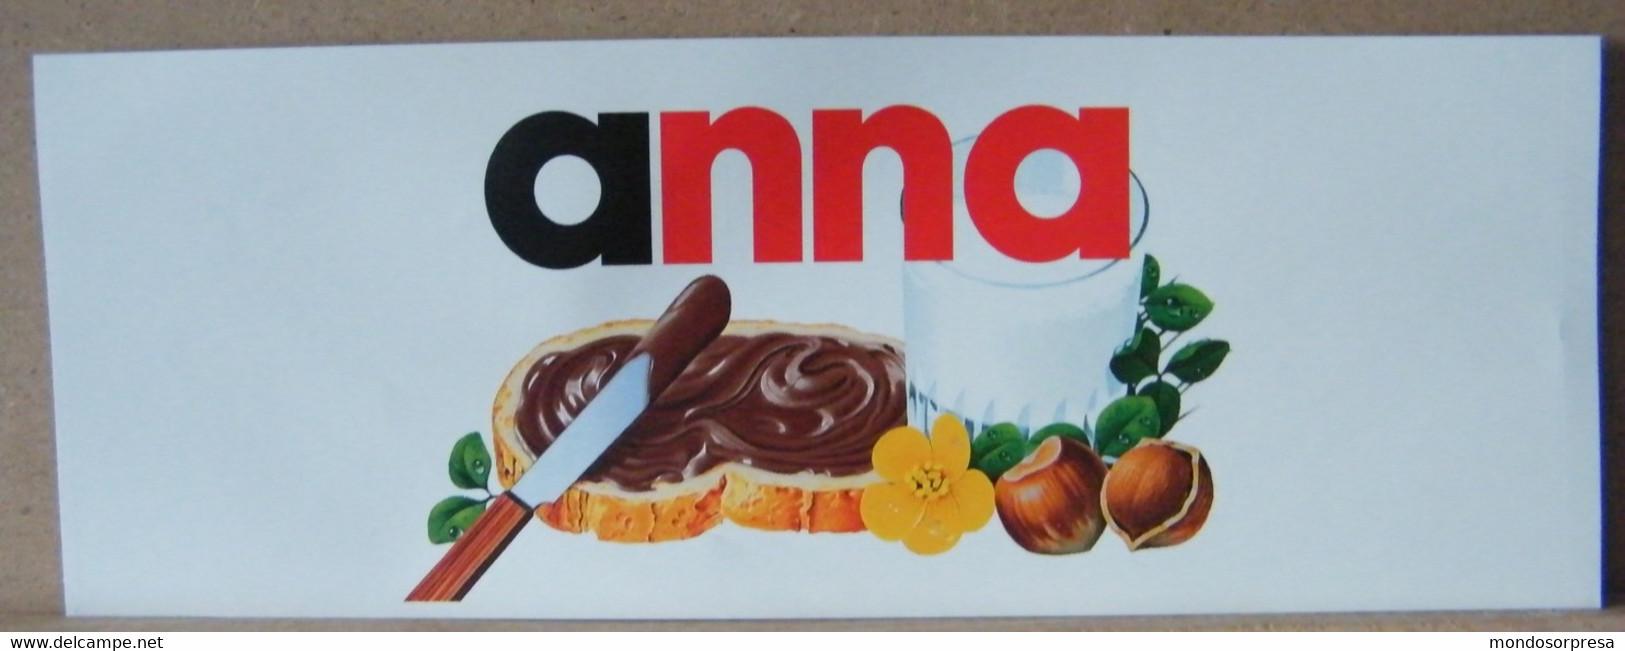 MONDOSORPRESA, ADESIVI NUTELLA NOMI, ANNA - Nutella